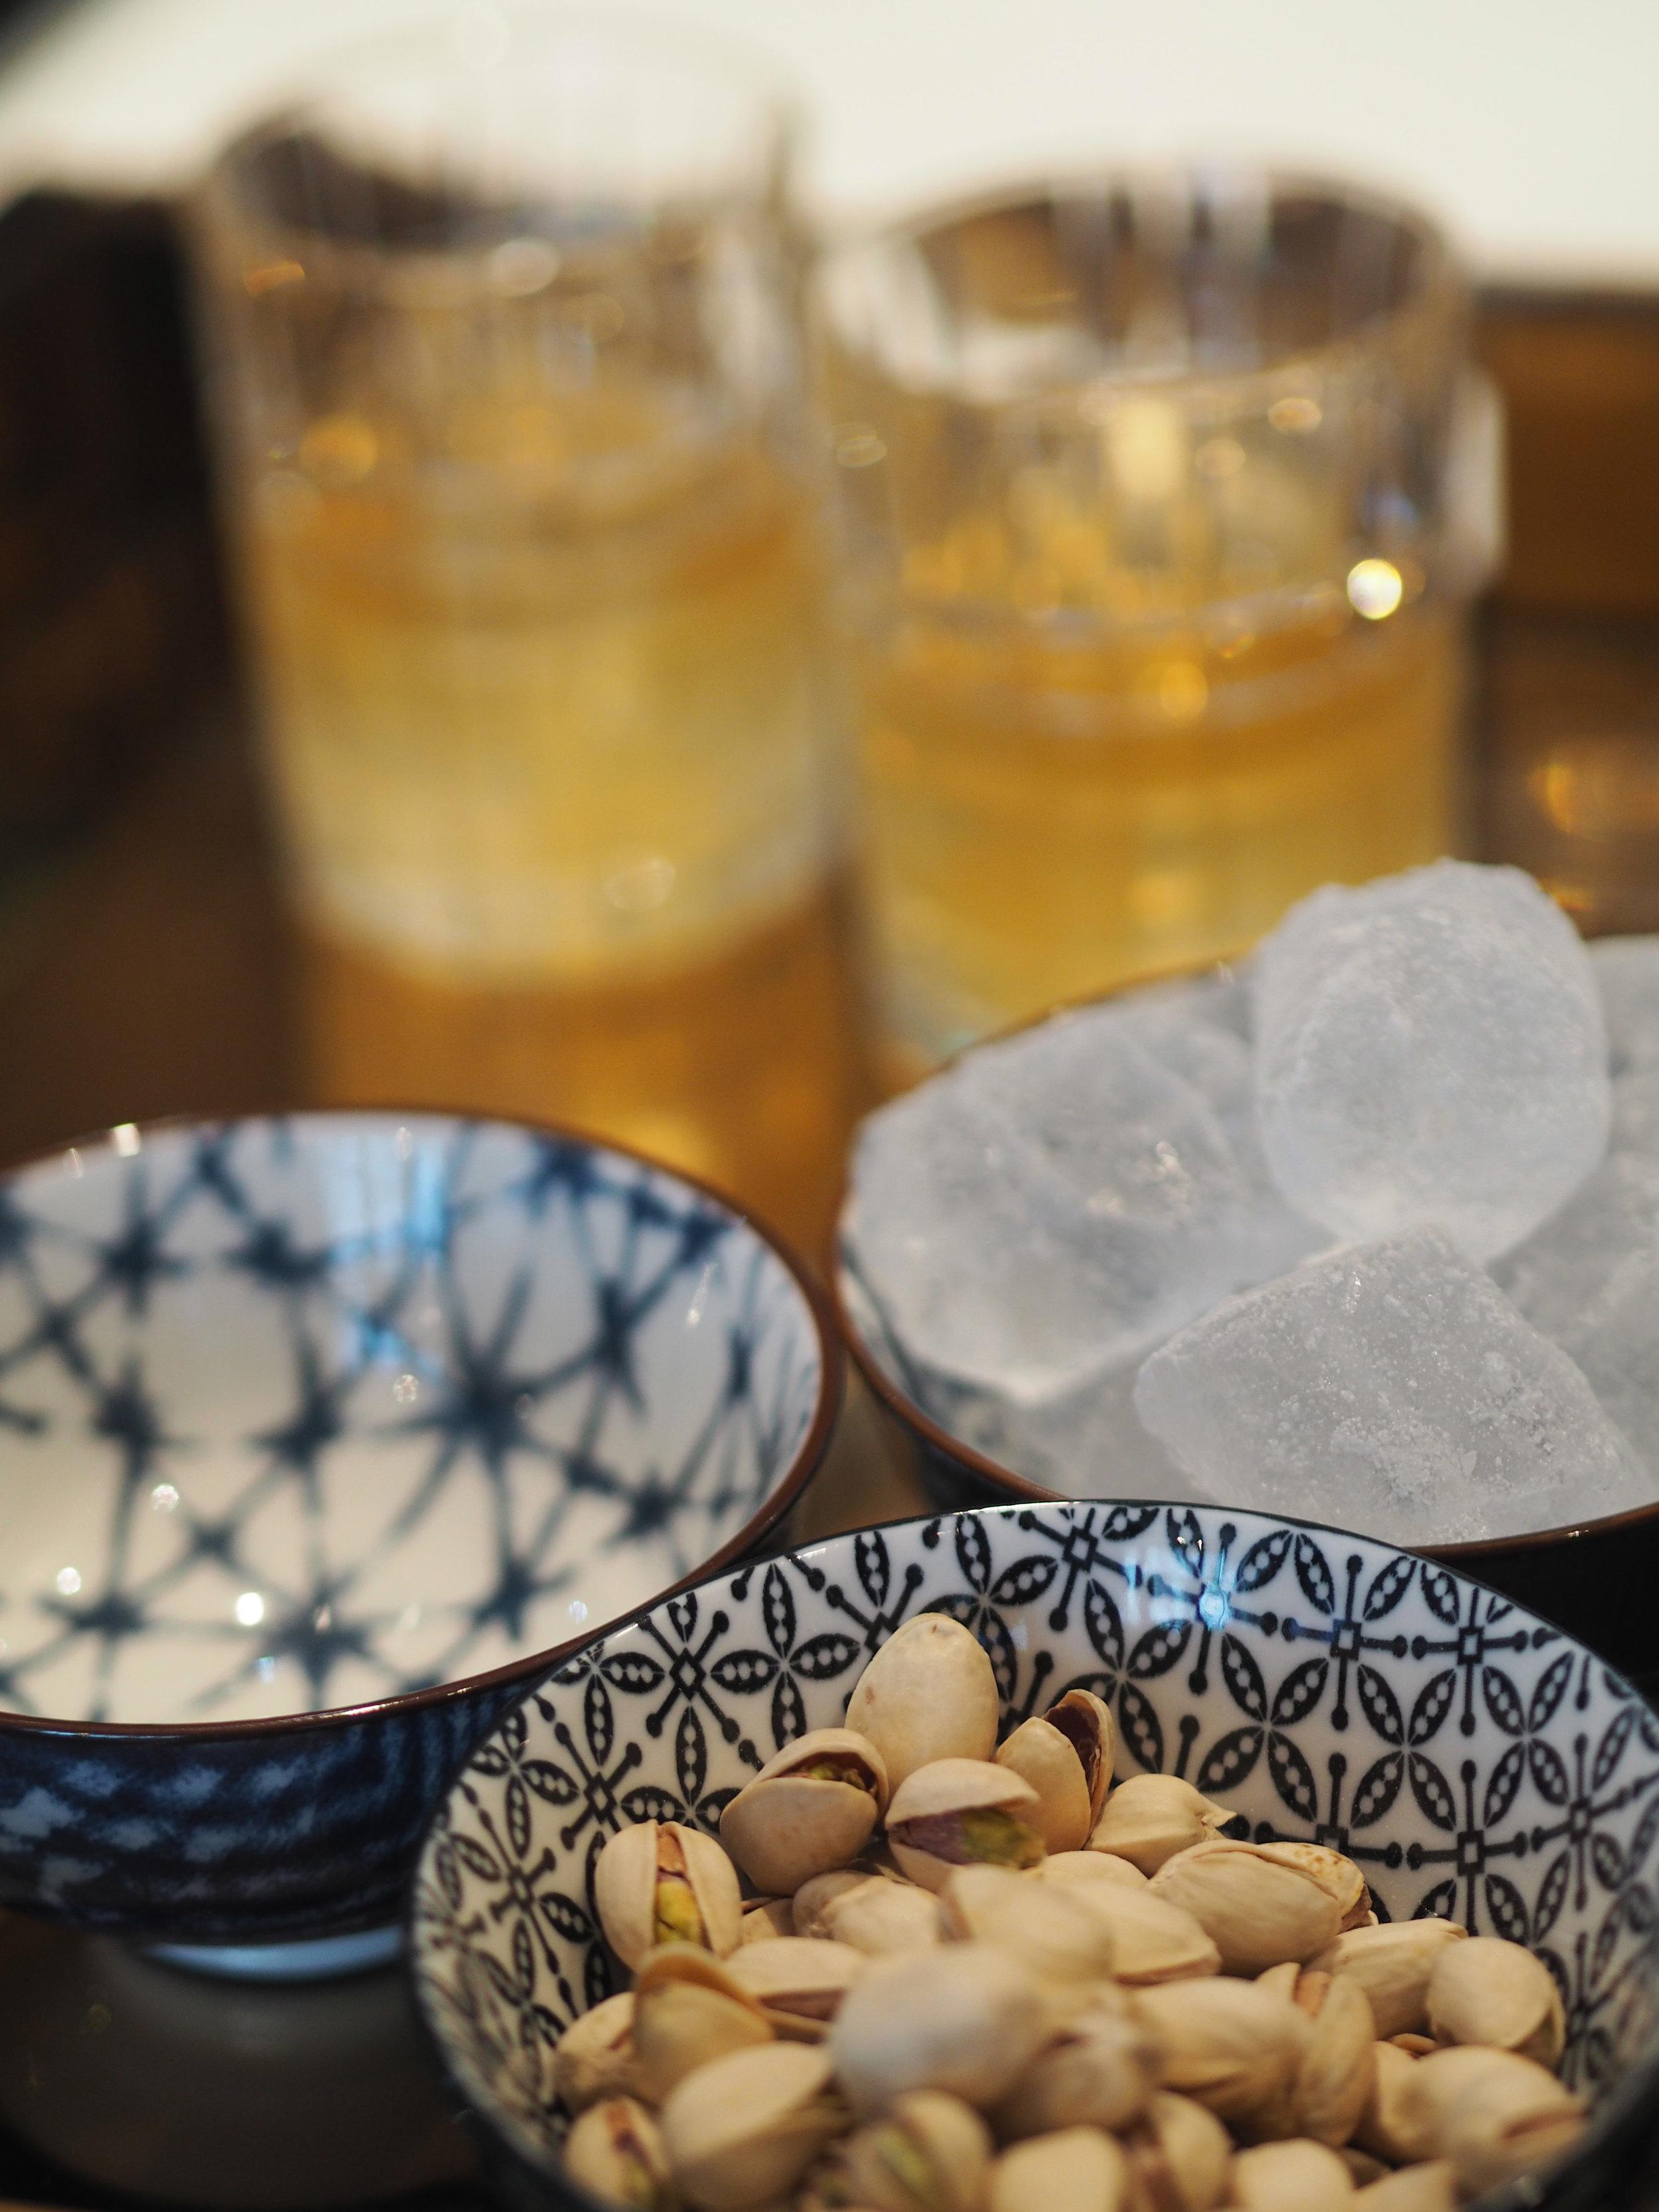 Pattern Bowls from Homesense